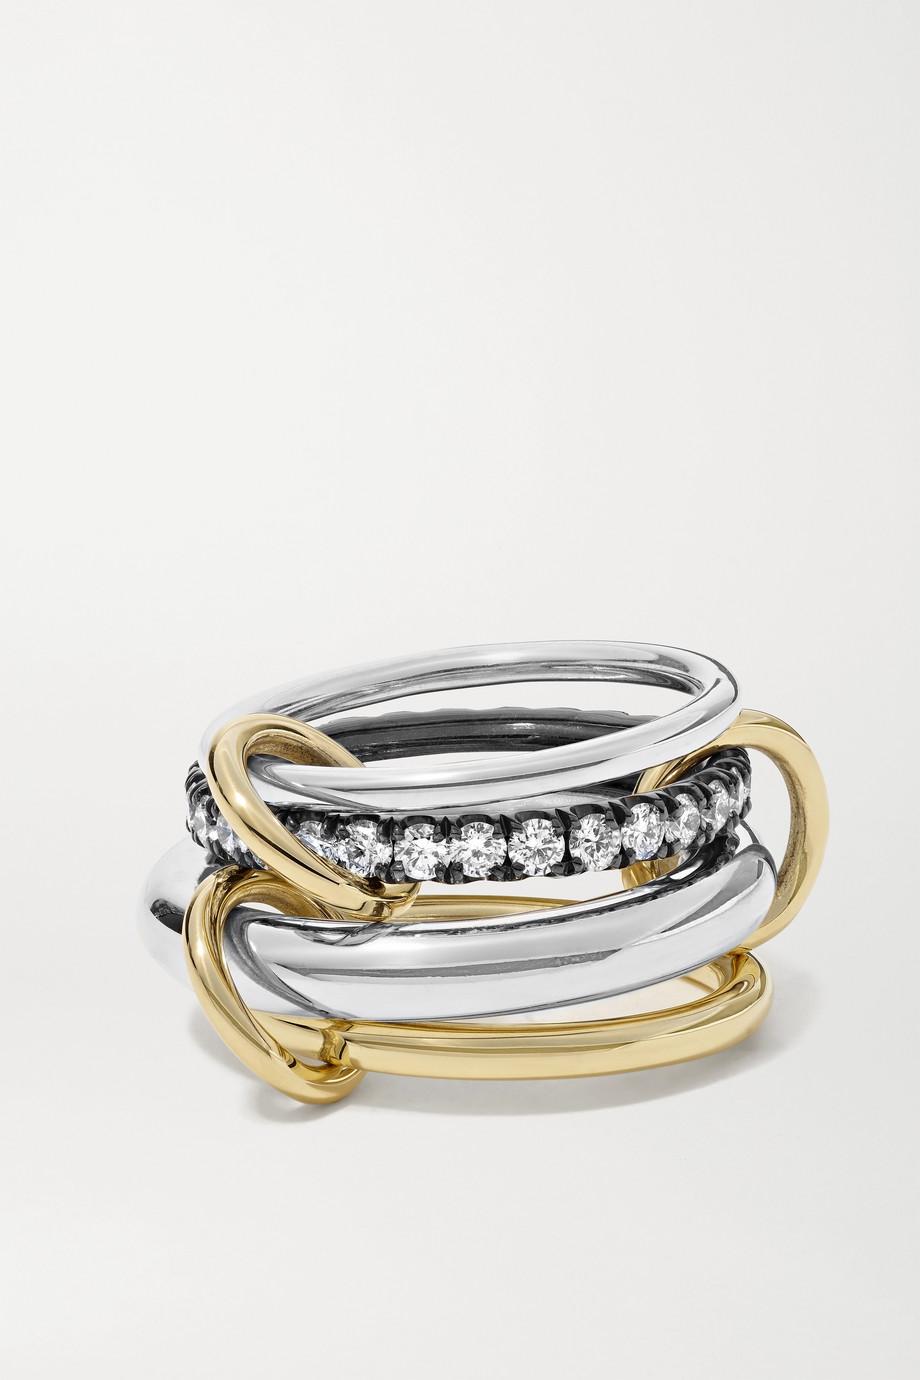 Spinelli Kilcollin Janssen set of four sterling silver and 18-karat gold diamond rings